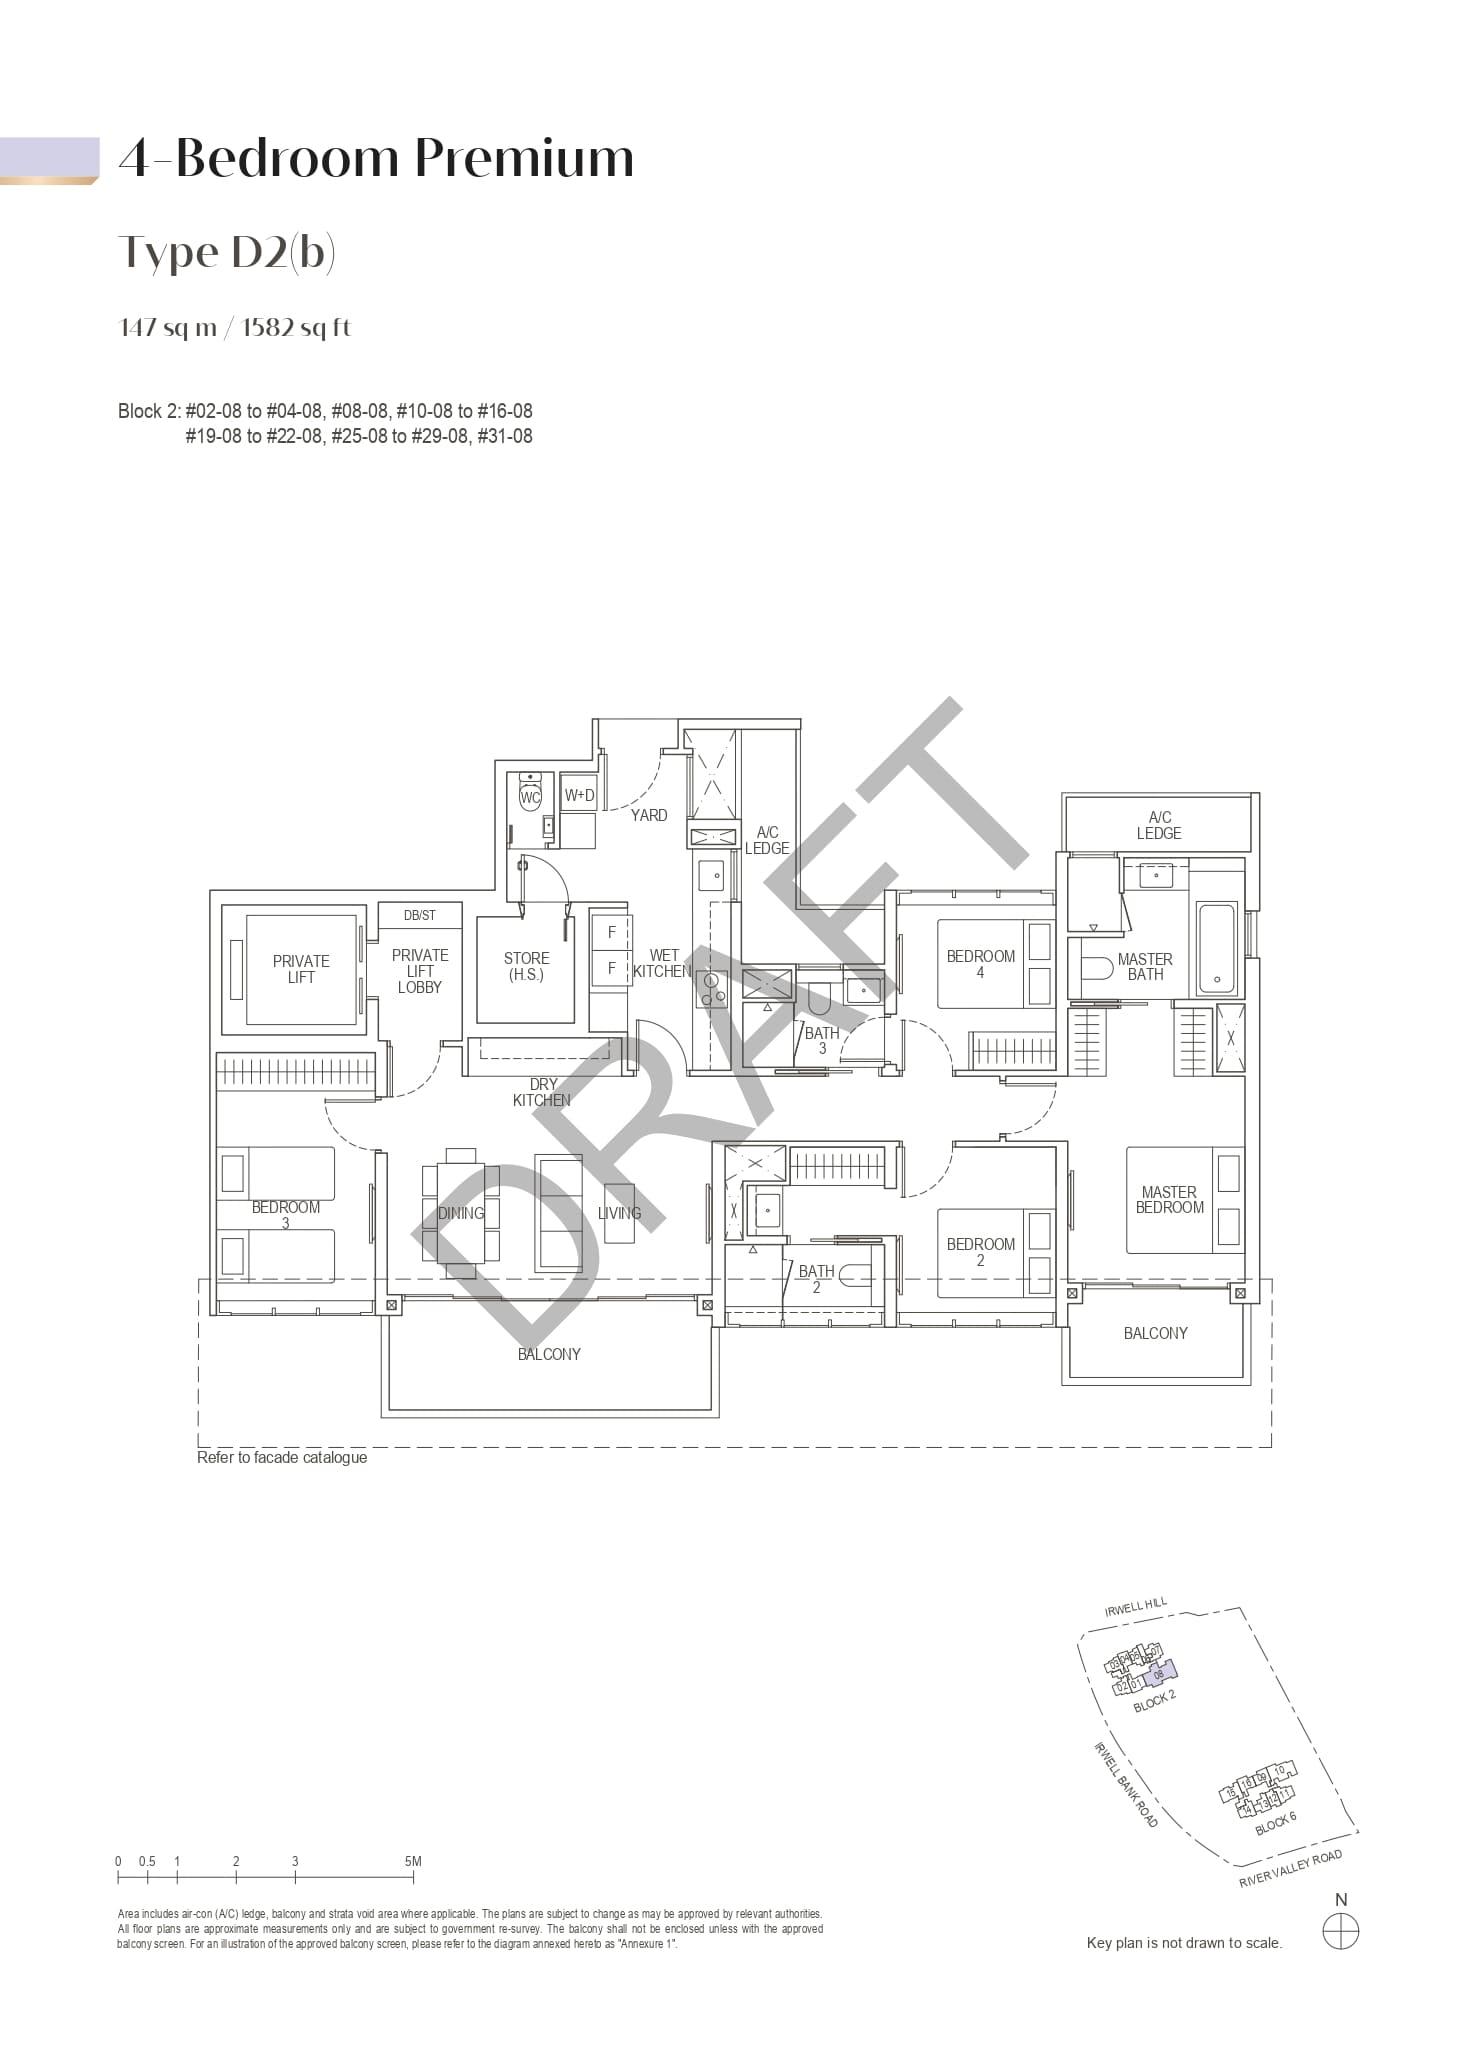 irwell-hill-residences-floor-plan-4-bedroom-premium-type-d2b